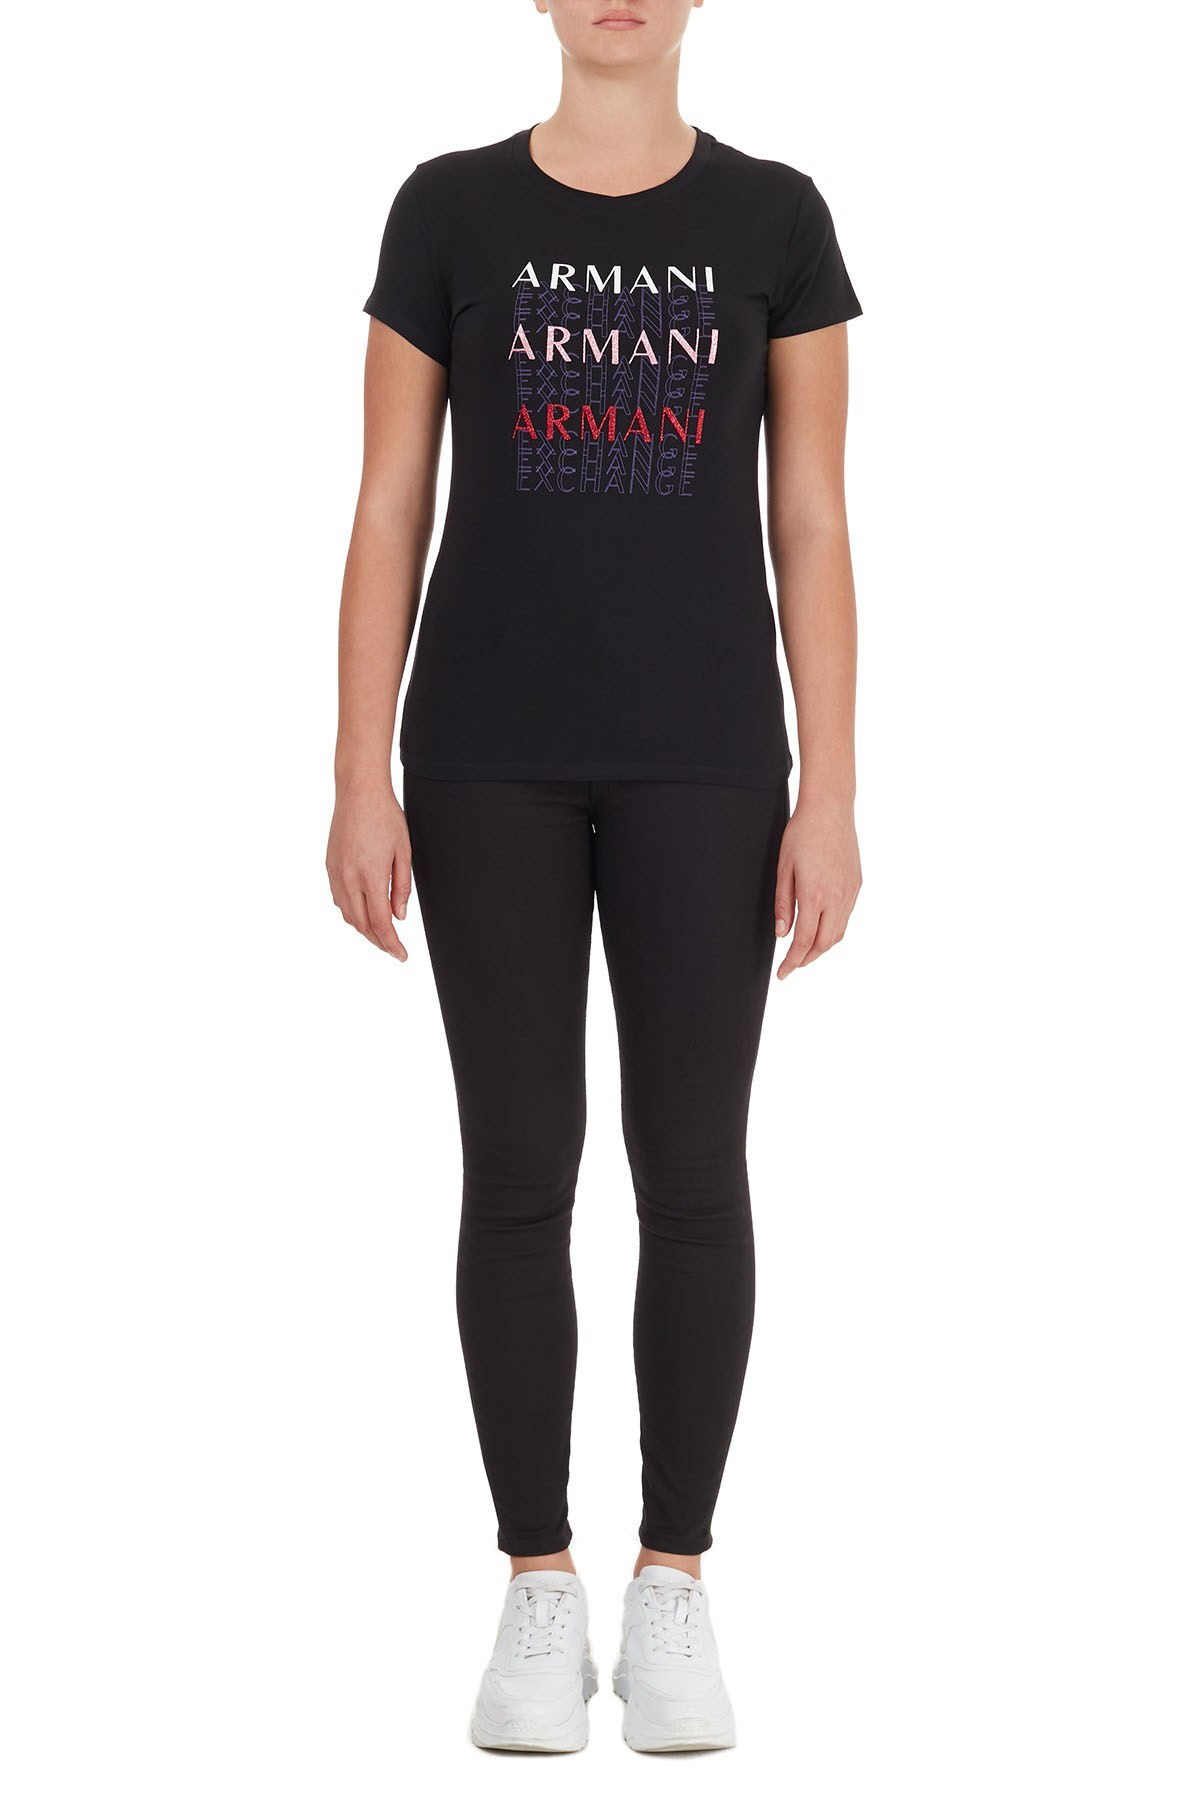 Armani Exchange Pamuklu Baskılı Bisiklet Yaka Bayan T Shirt 6HYTAM YJ7GZ 1200 SİYAH